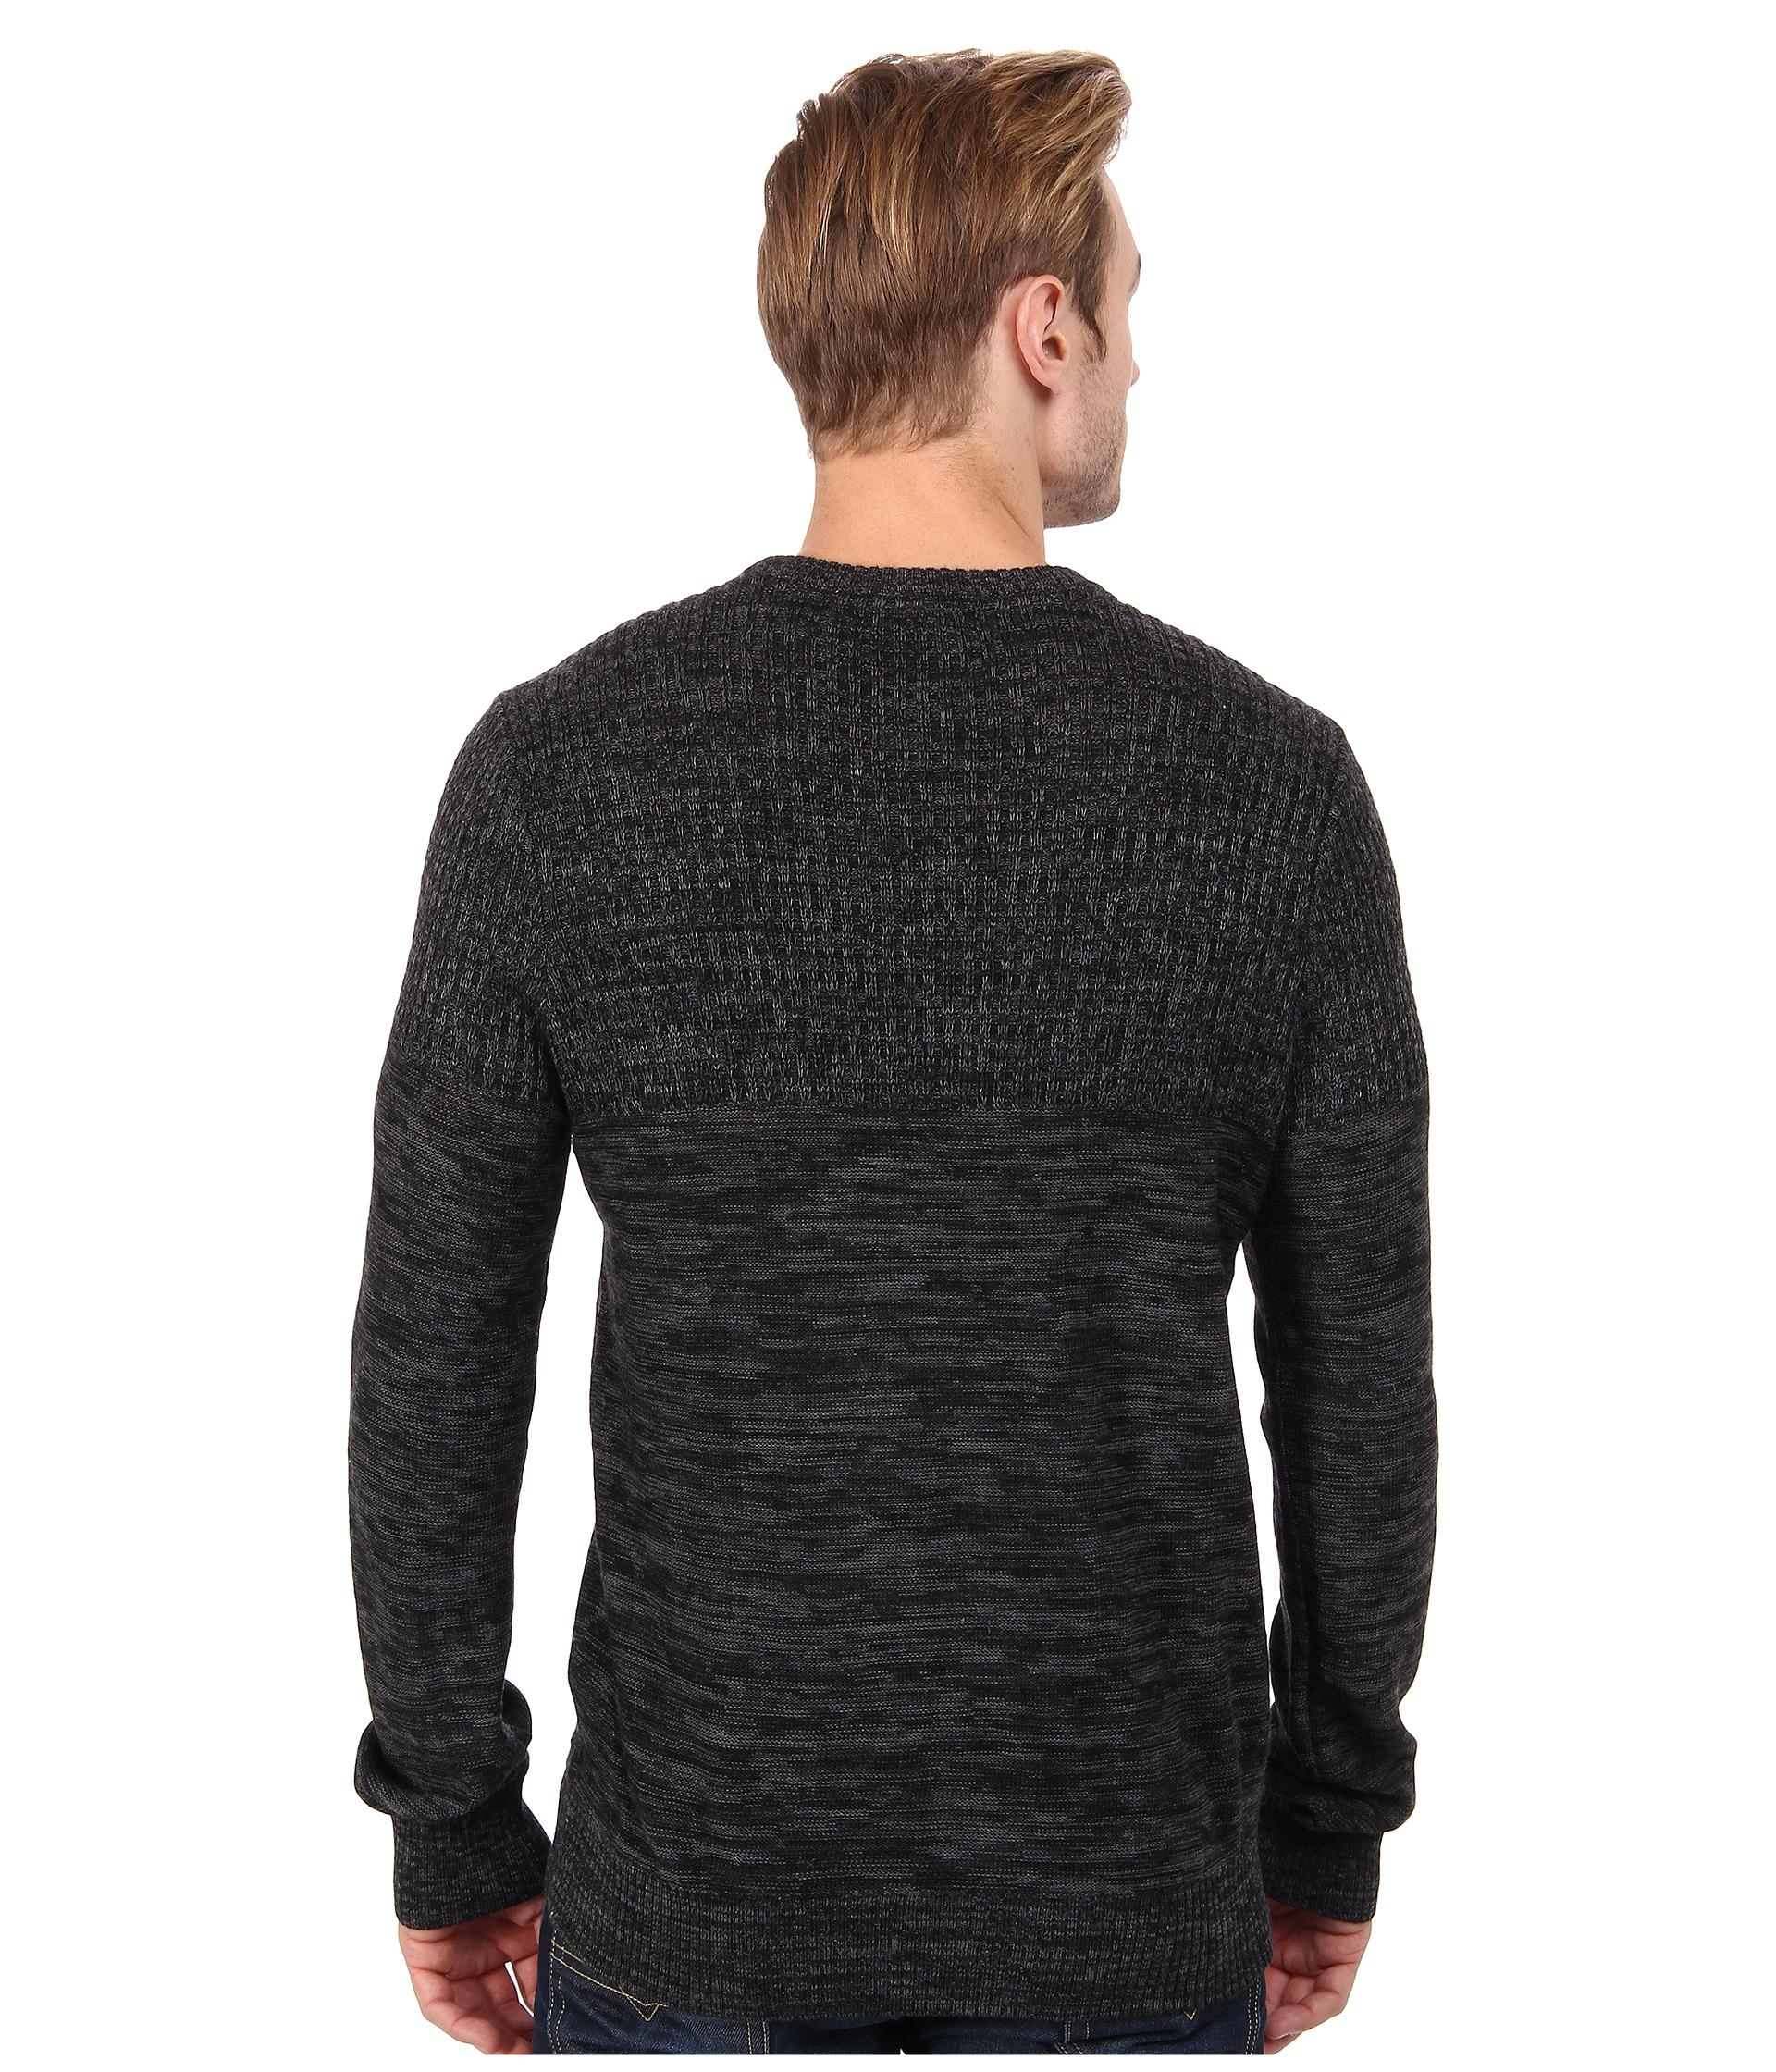 calvin klein jeans parallel knit stripe crew neck sweater. Black Bedroom Furniture Sets. Home Design Ideas